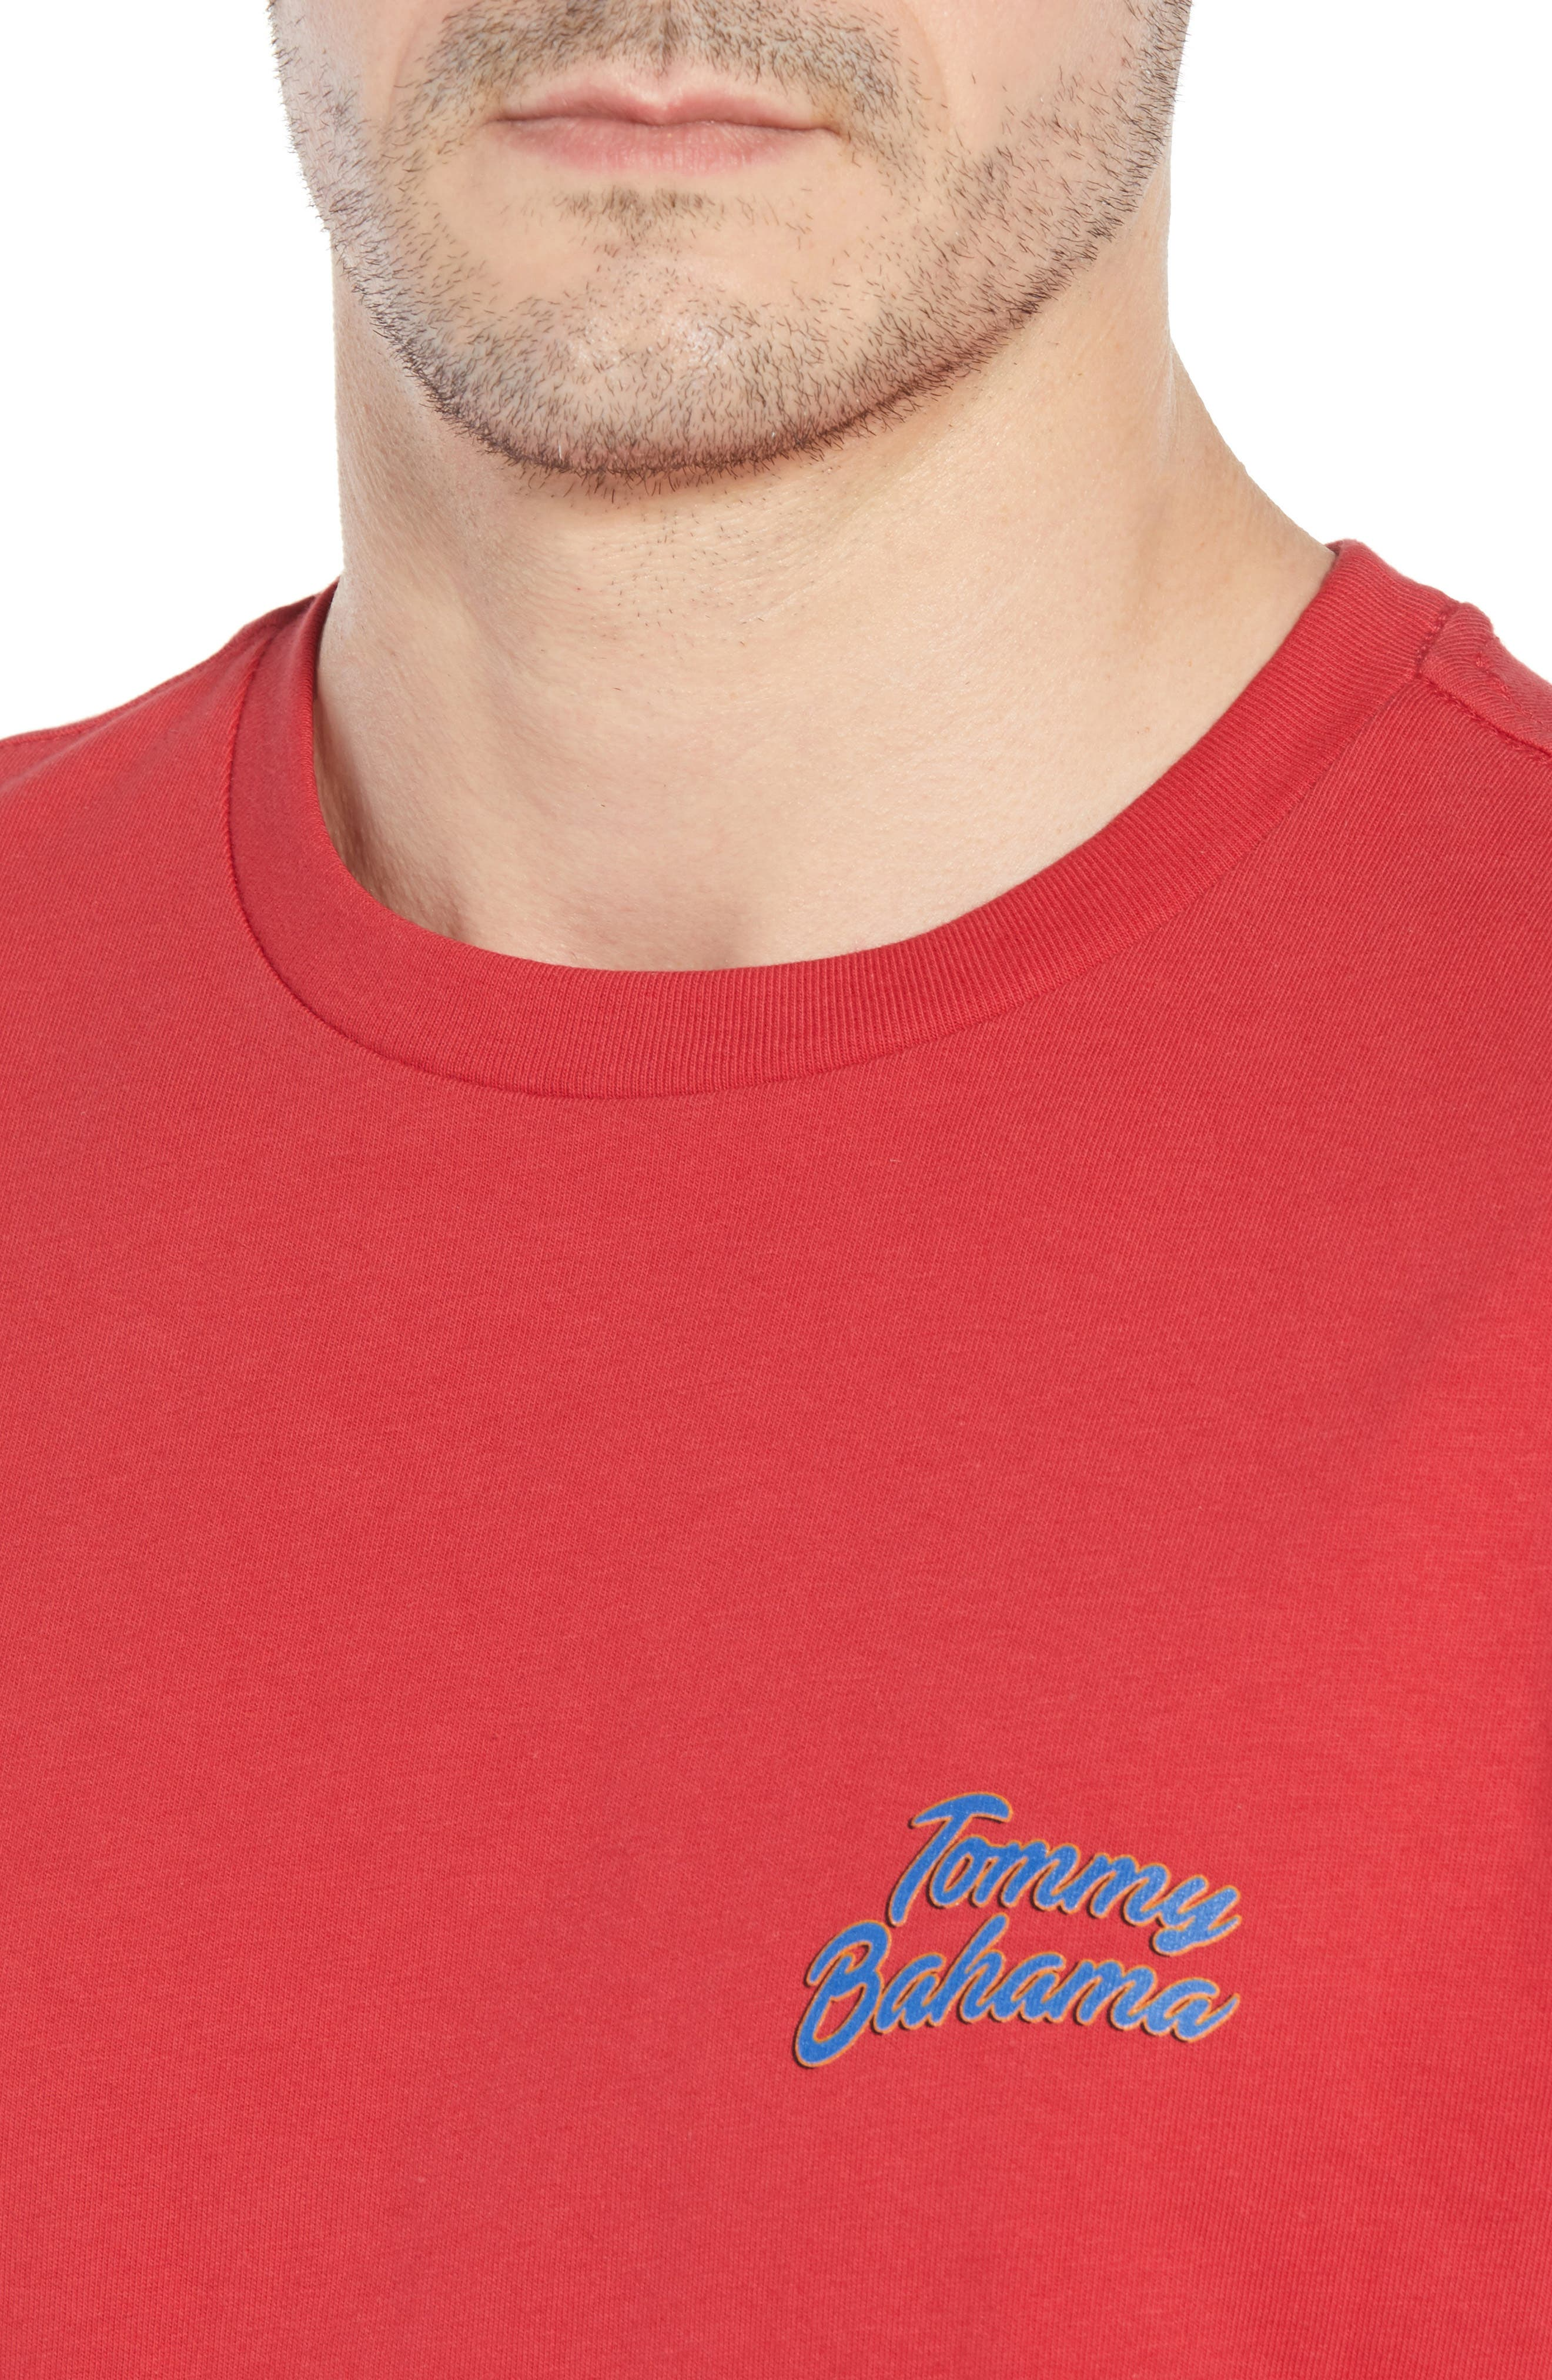 Thirst Base Graphic T-Shirt,                             Alternate thumbnail 4, color,                             600